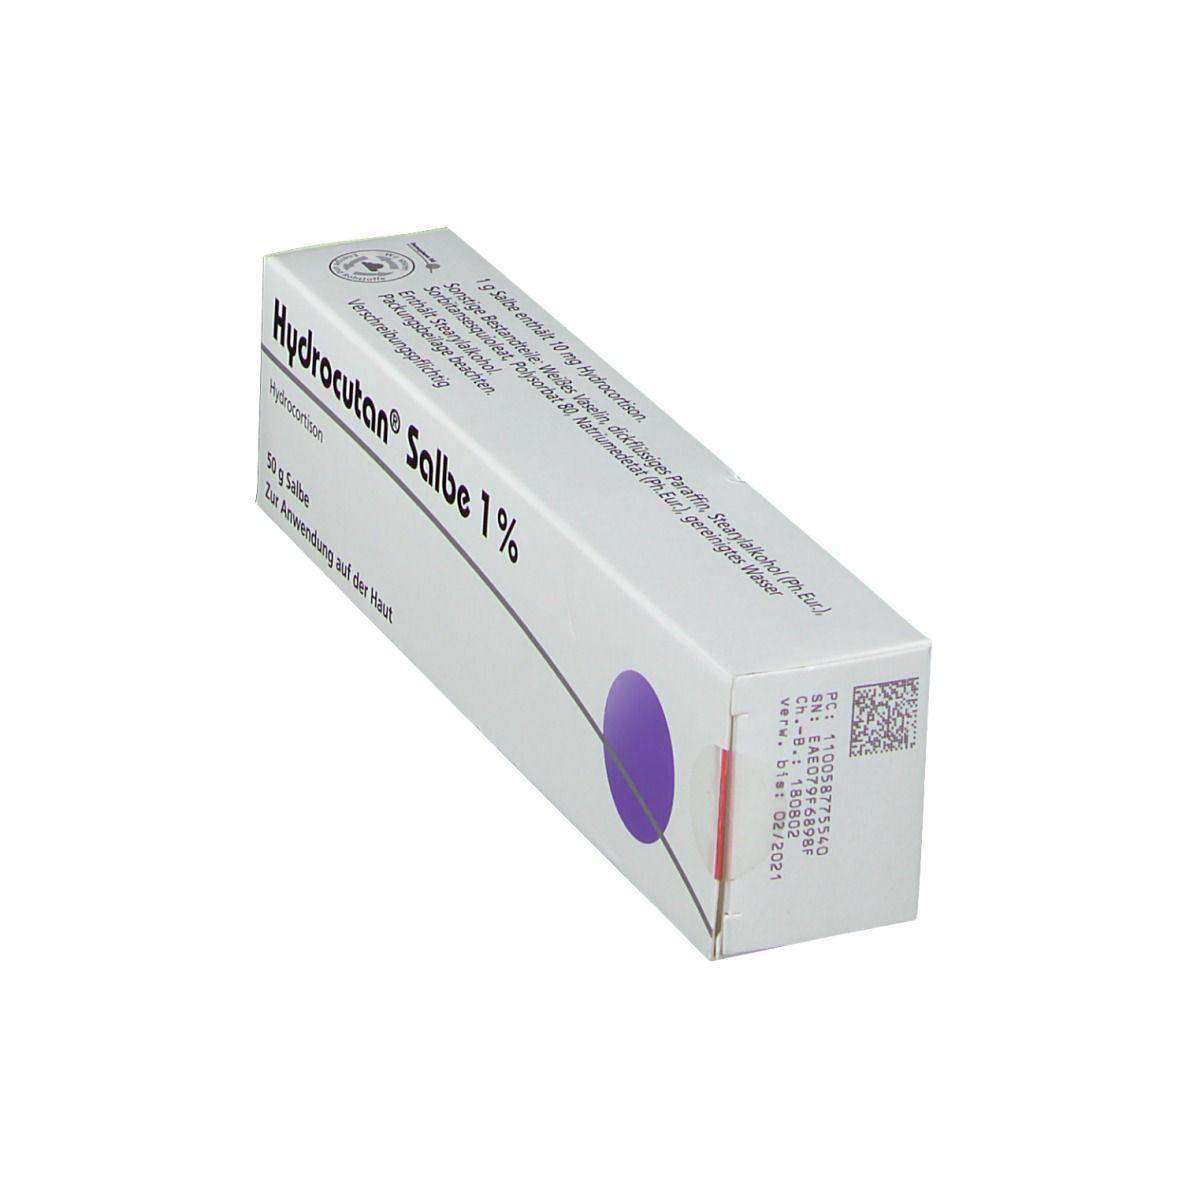 Hydrocutan Salbe 1%